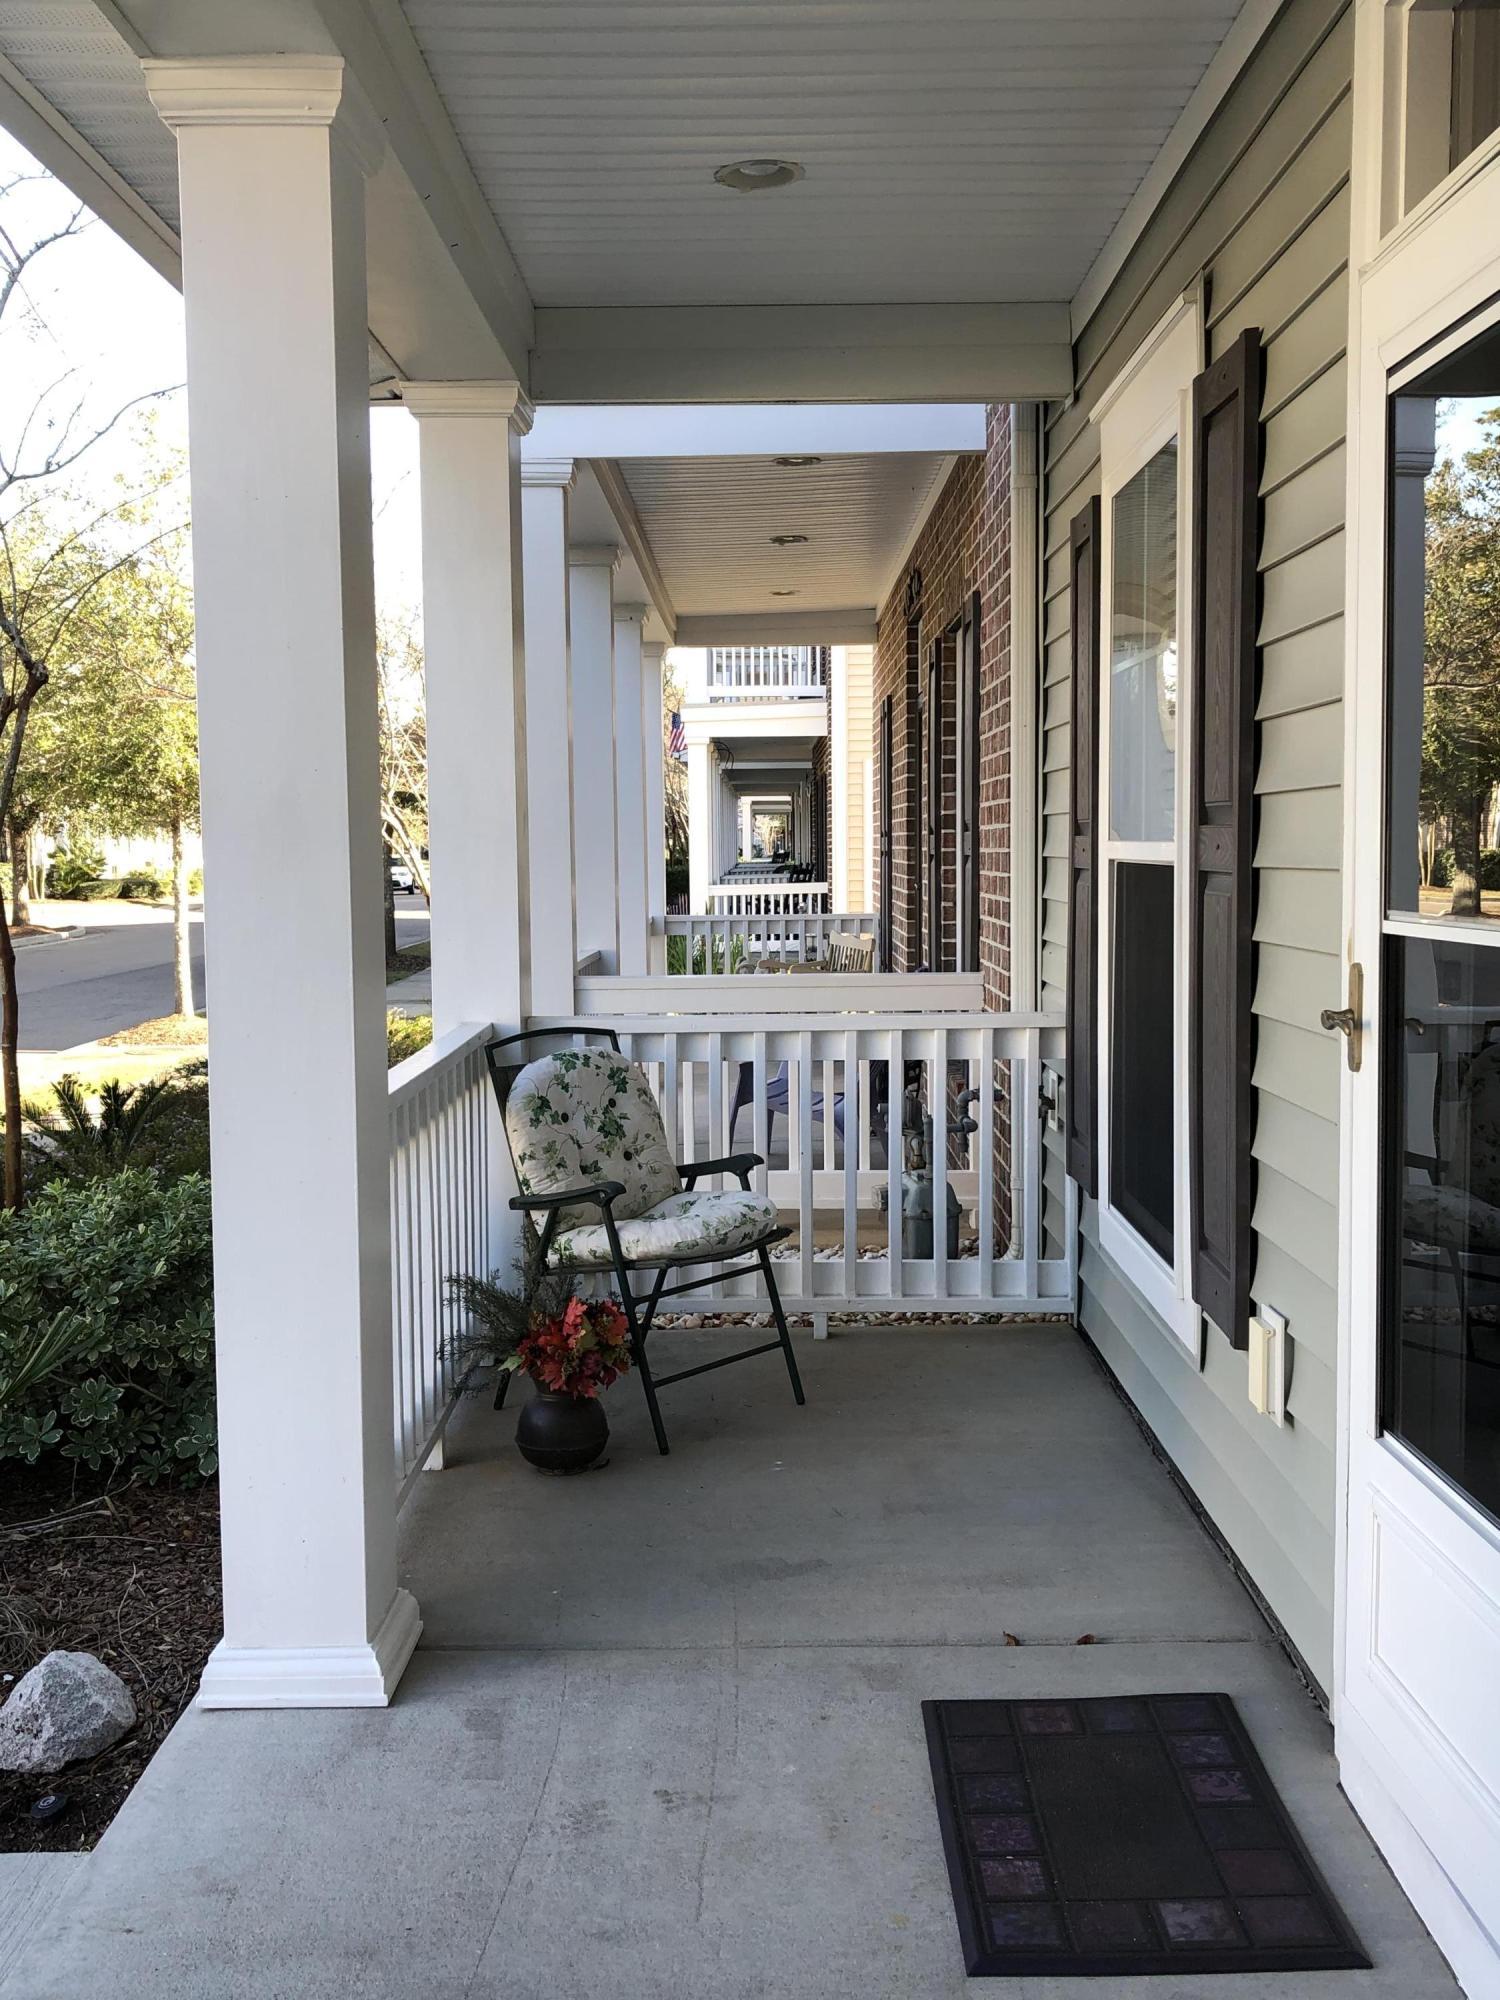 Boltons Landing Homes For Sale - 1445 Nautical Chart, Charleston, SC - 2